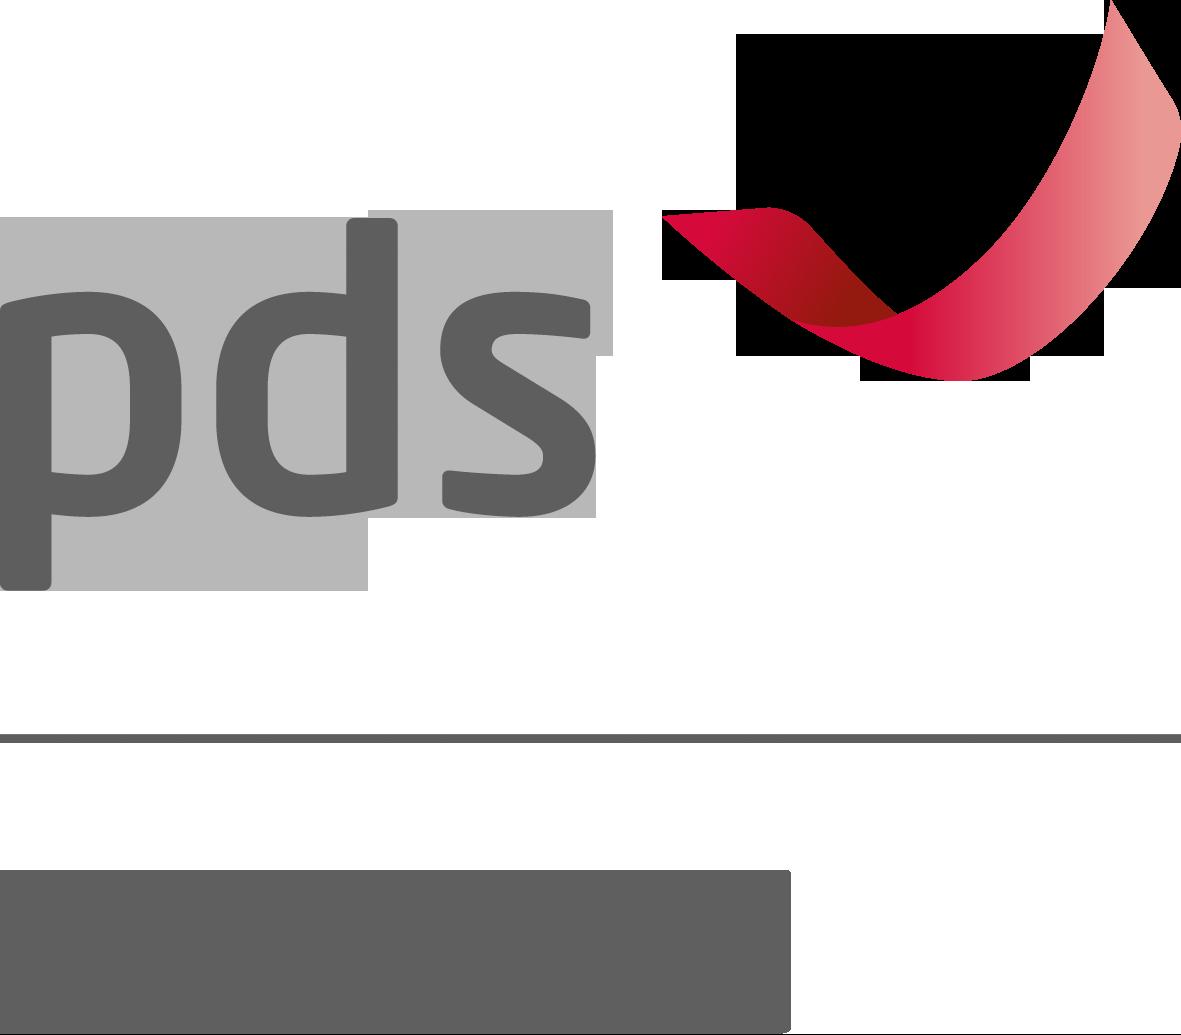 pds_Material_Logo